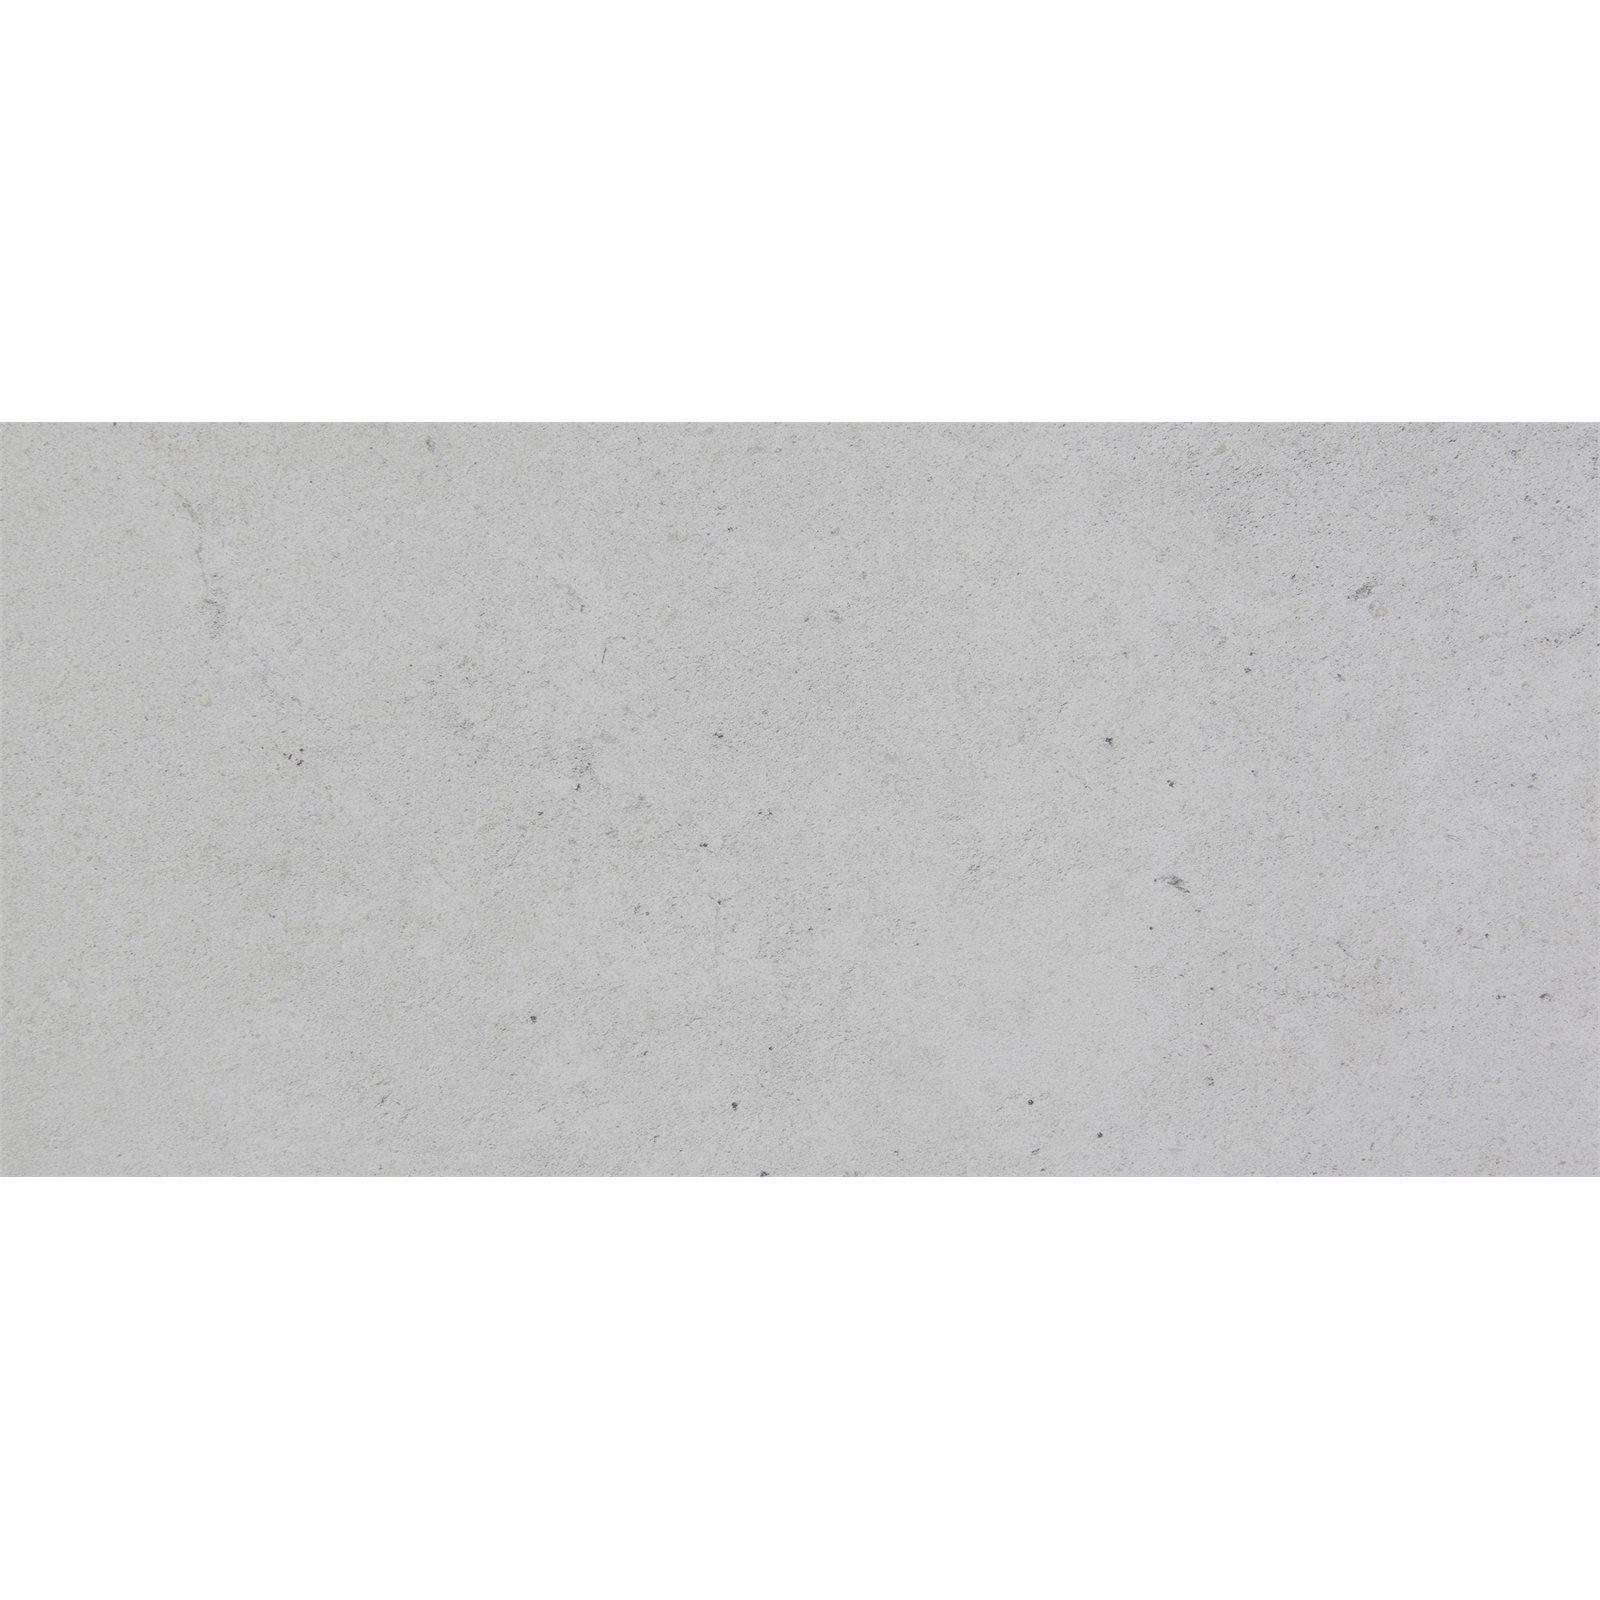 Seratone 2400 x 1200 x 4.5mm Concrete Matte Aqua Tile